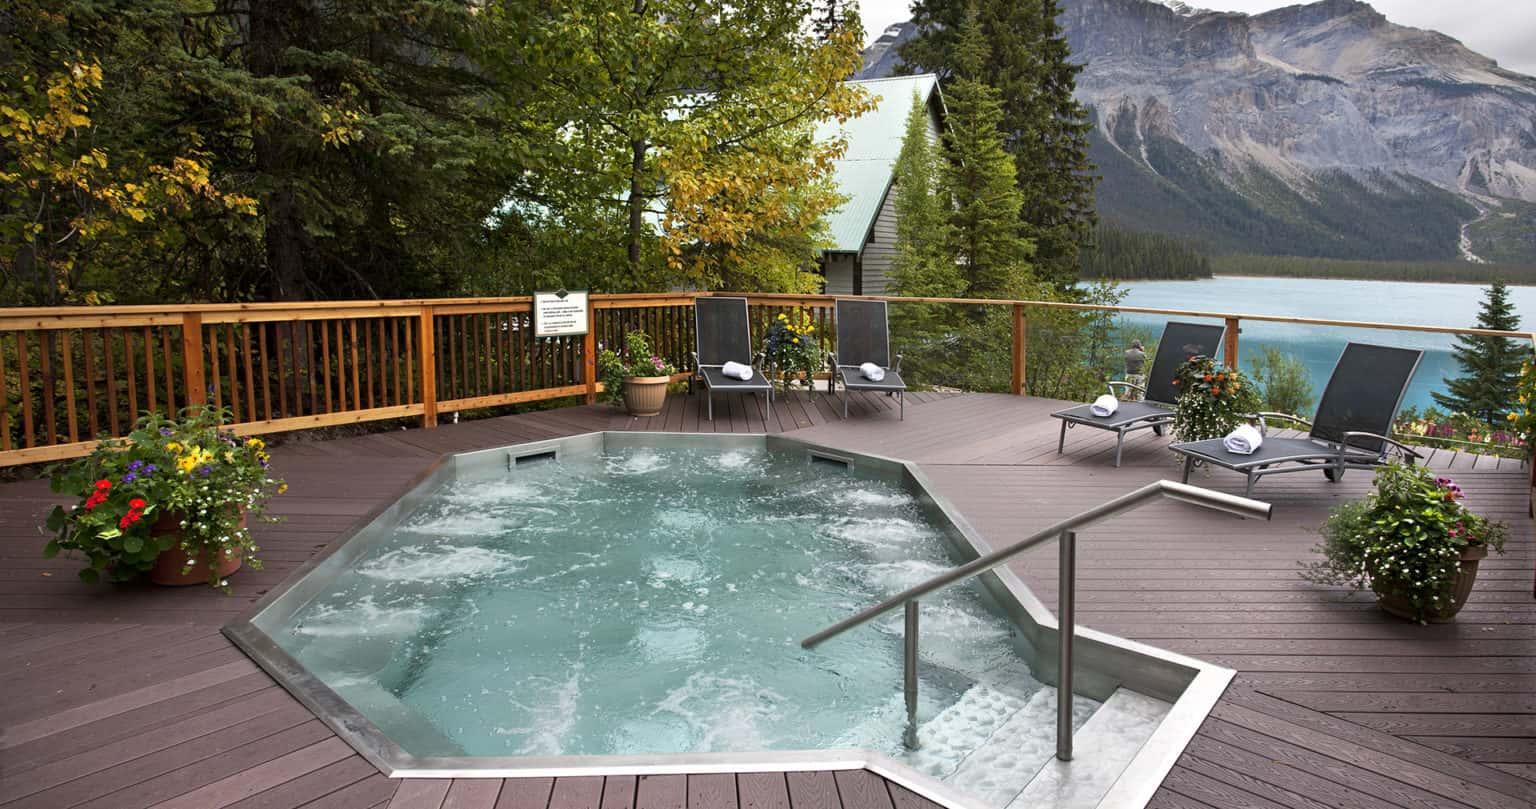 Hot Tub Facilities Available at Emerald Lake Lodge in Yoho National Park